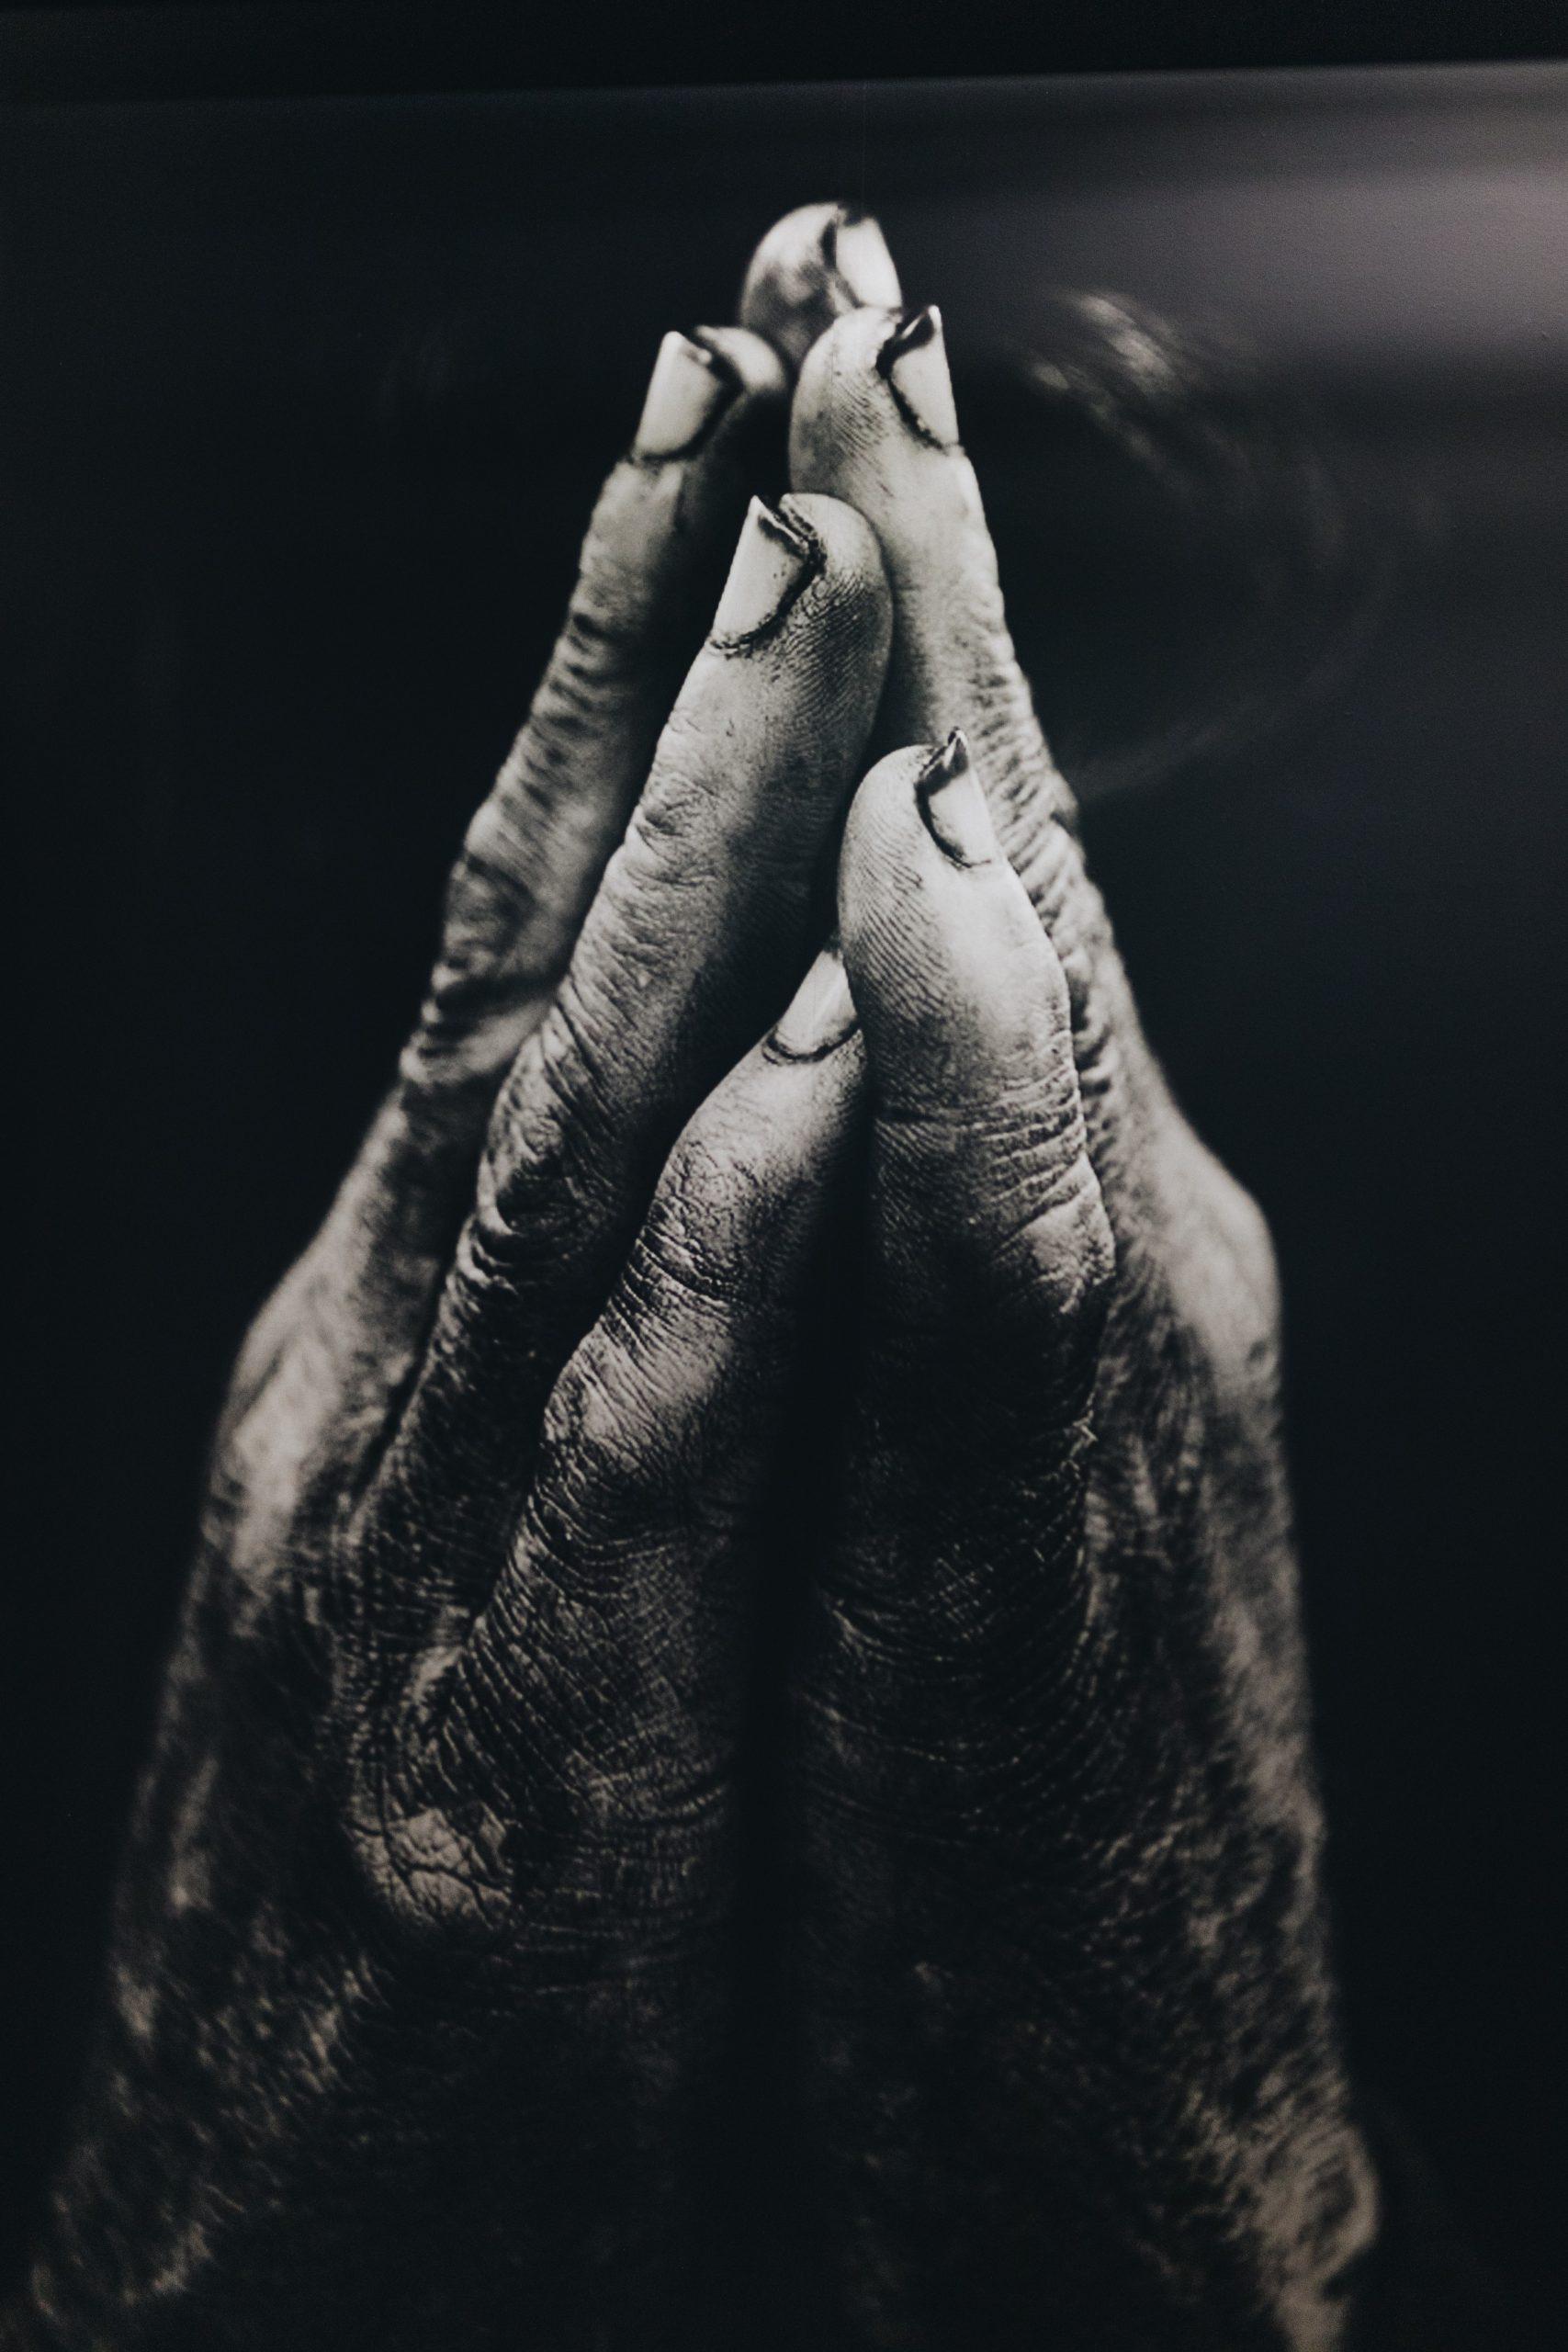 rugged-hands-praying